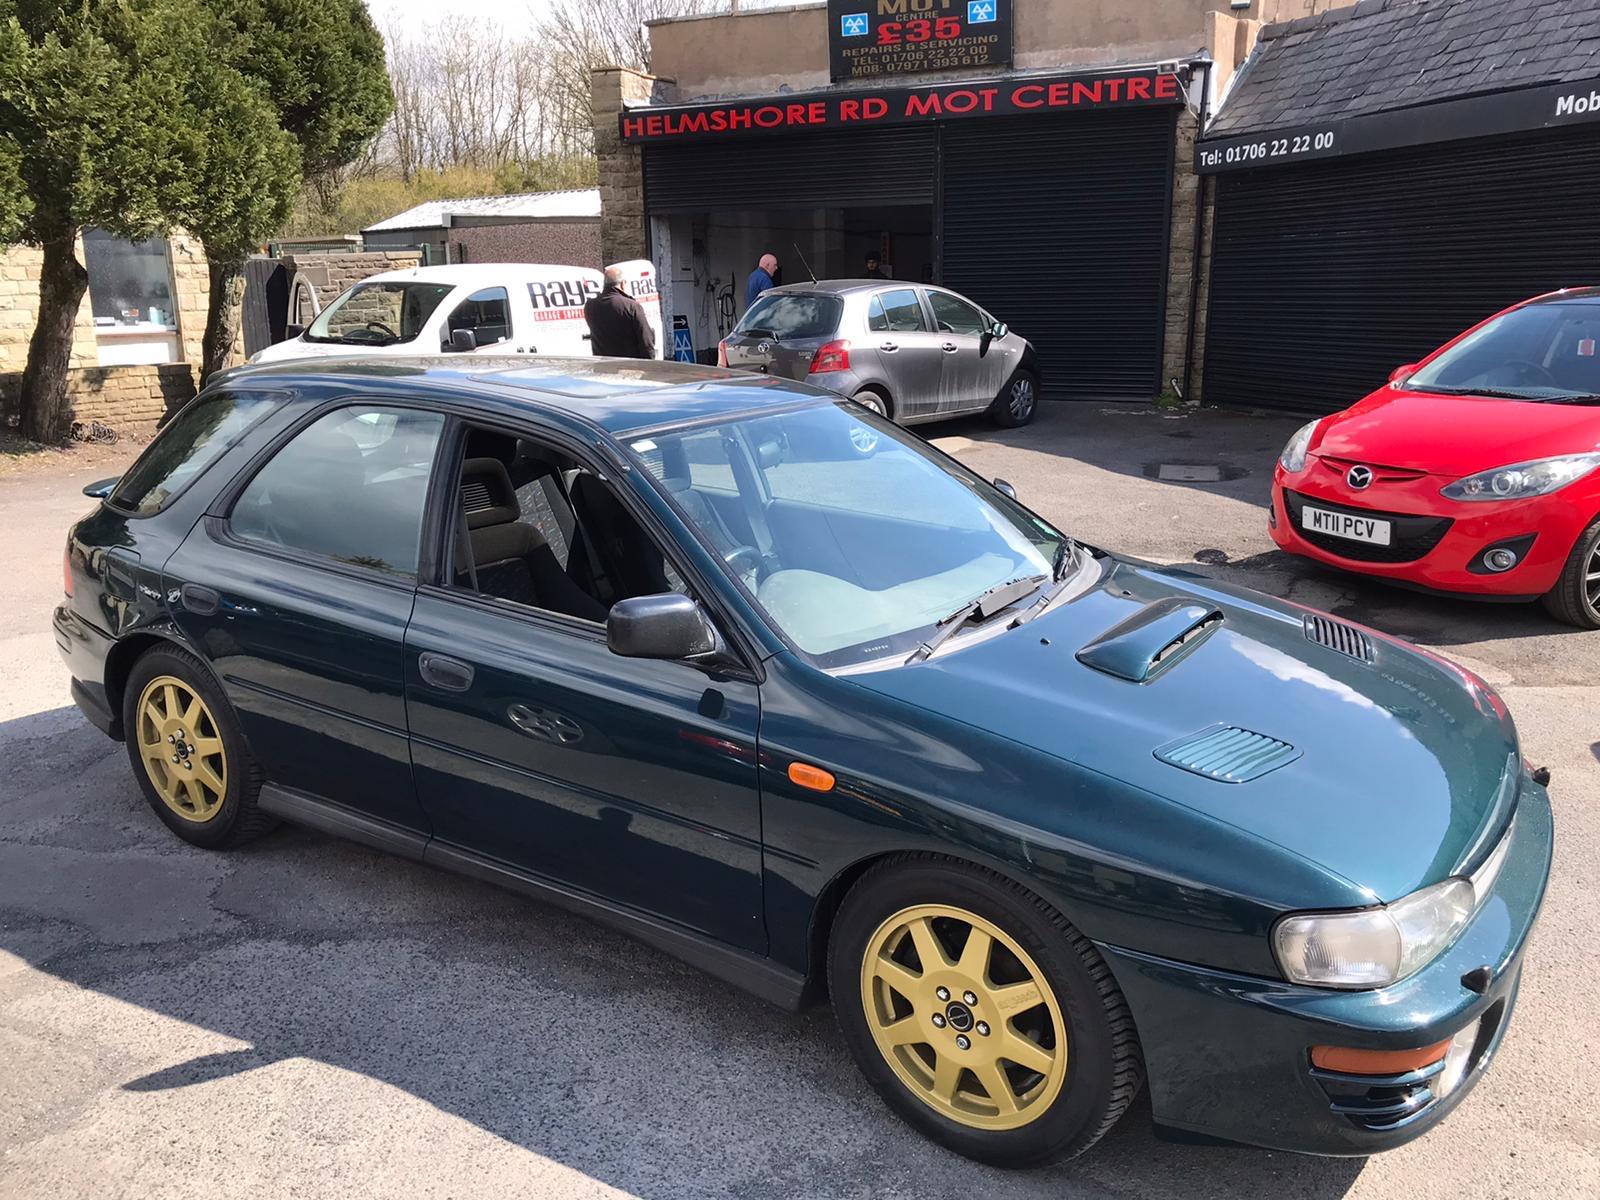 Our classics: 1996 Subaru Impreza Turbo